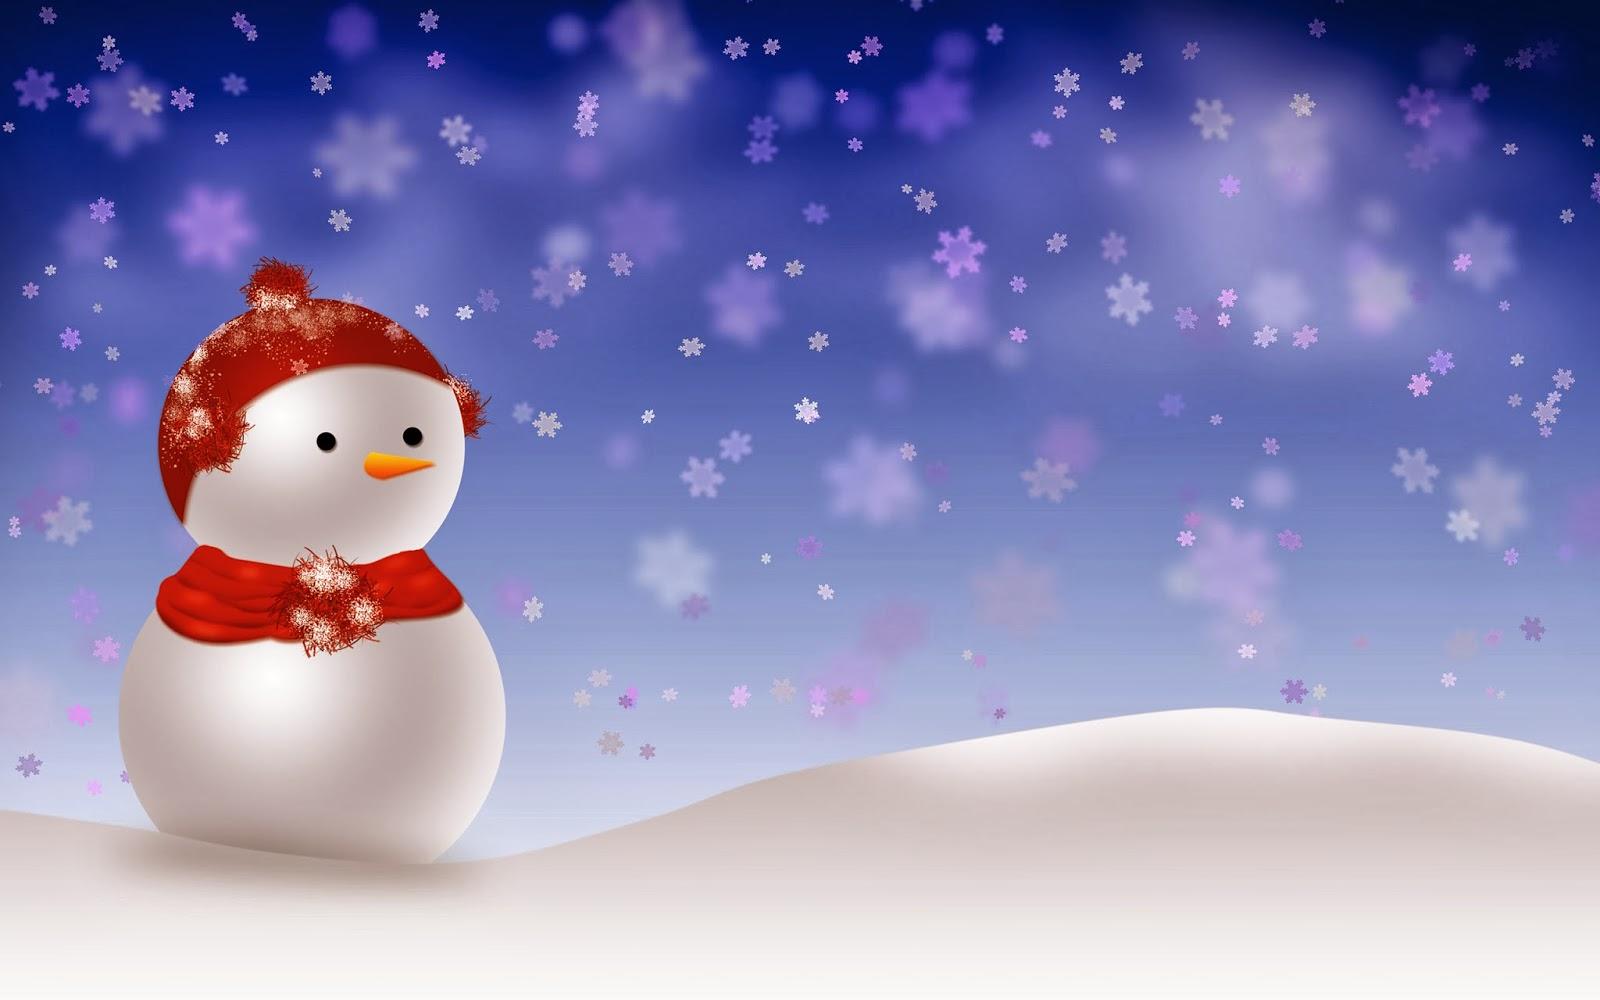 Desktop Backgrounds 4U Snowmen 1600x1000